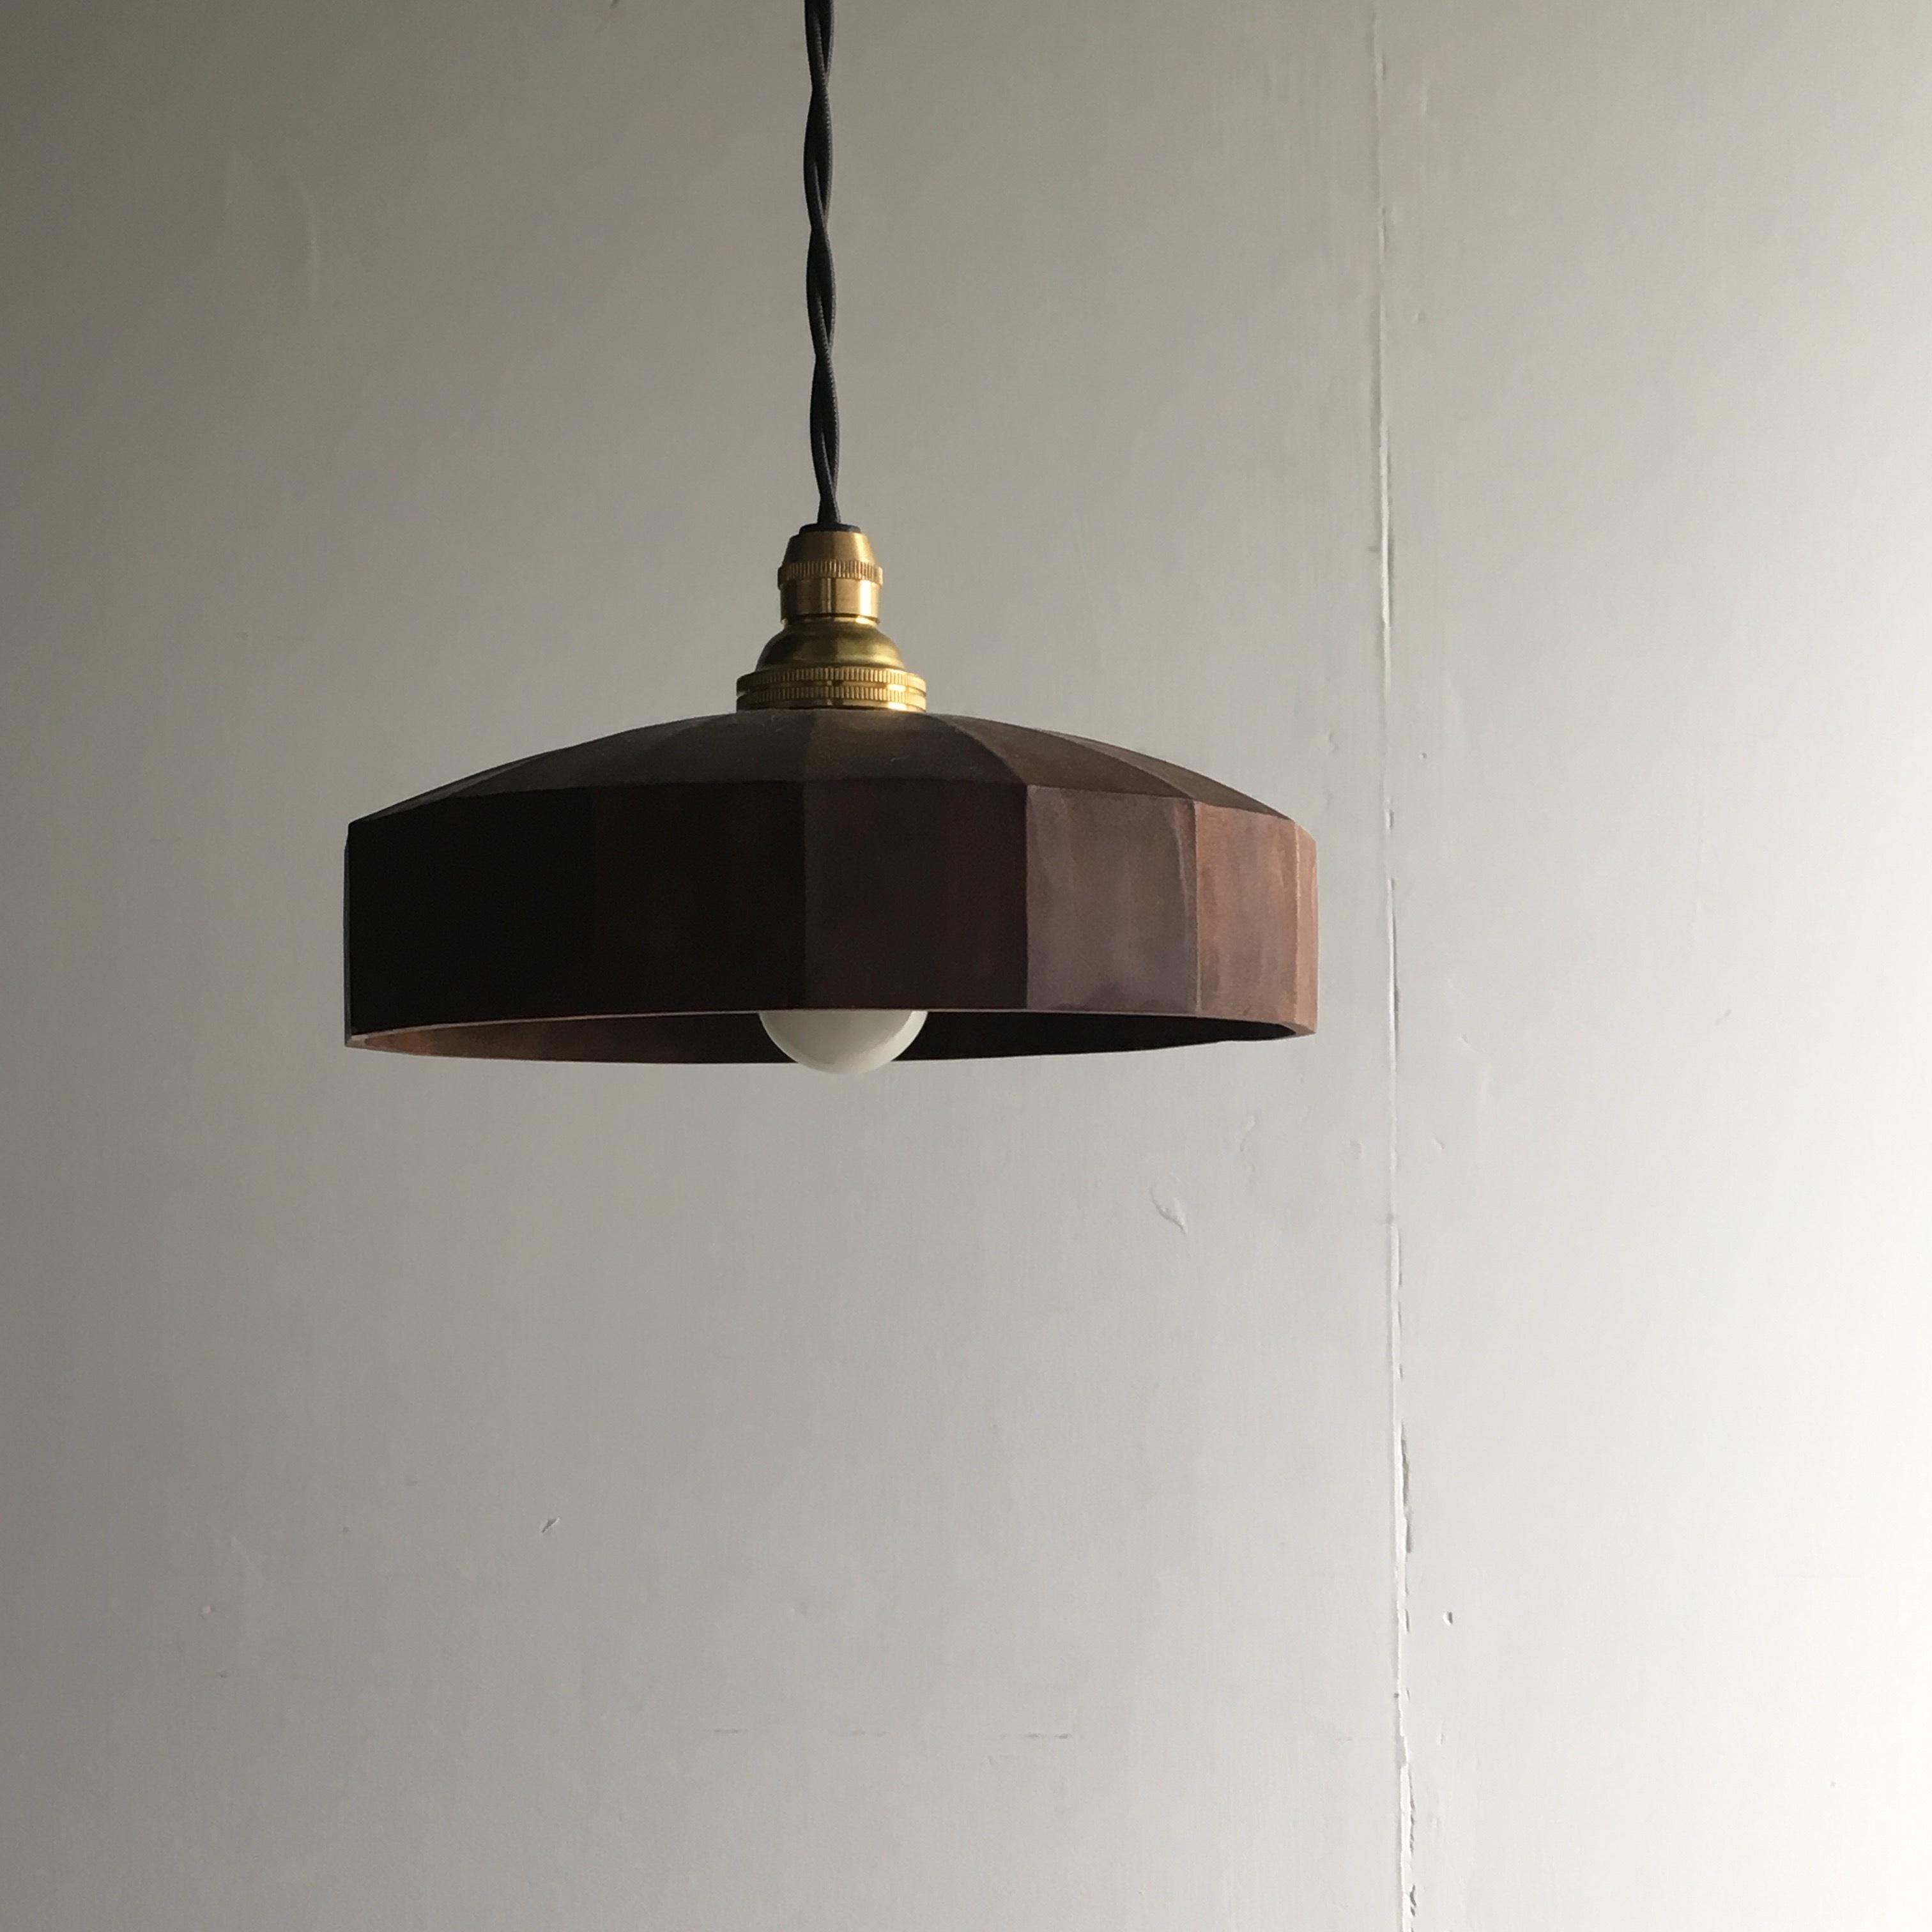 Lamp shade 16面型 /  柿渋仕上げ